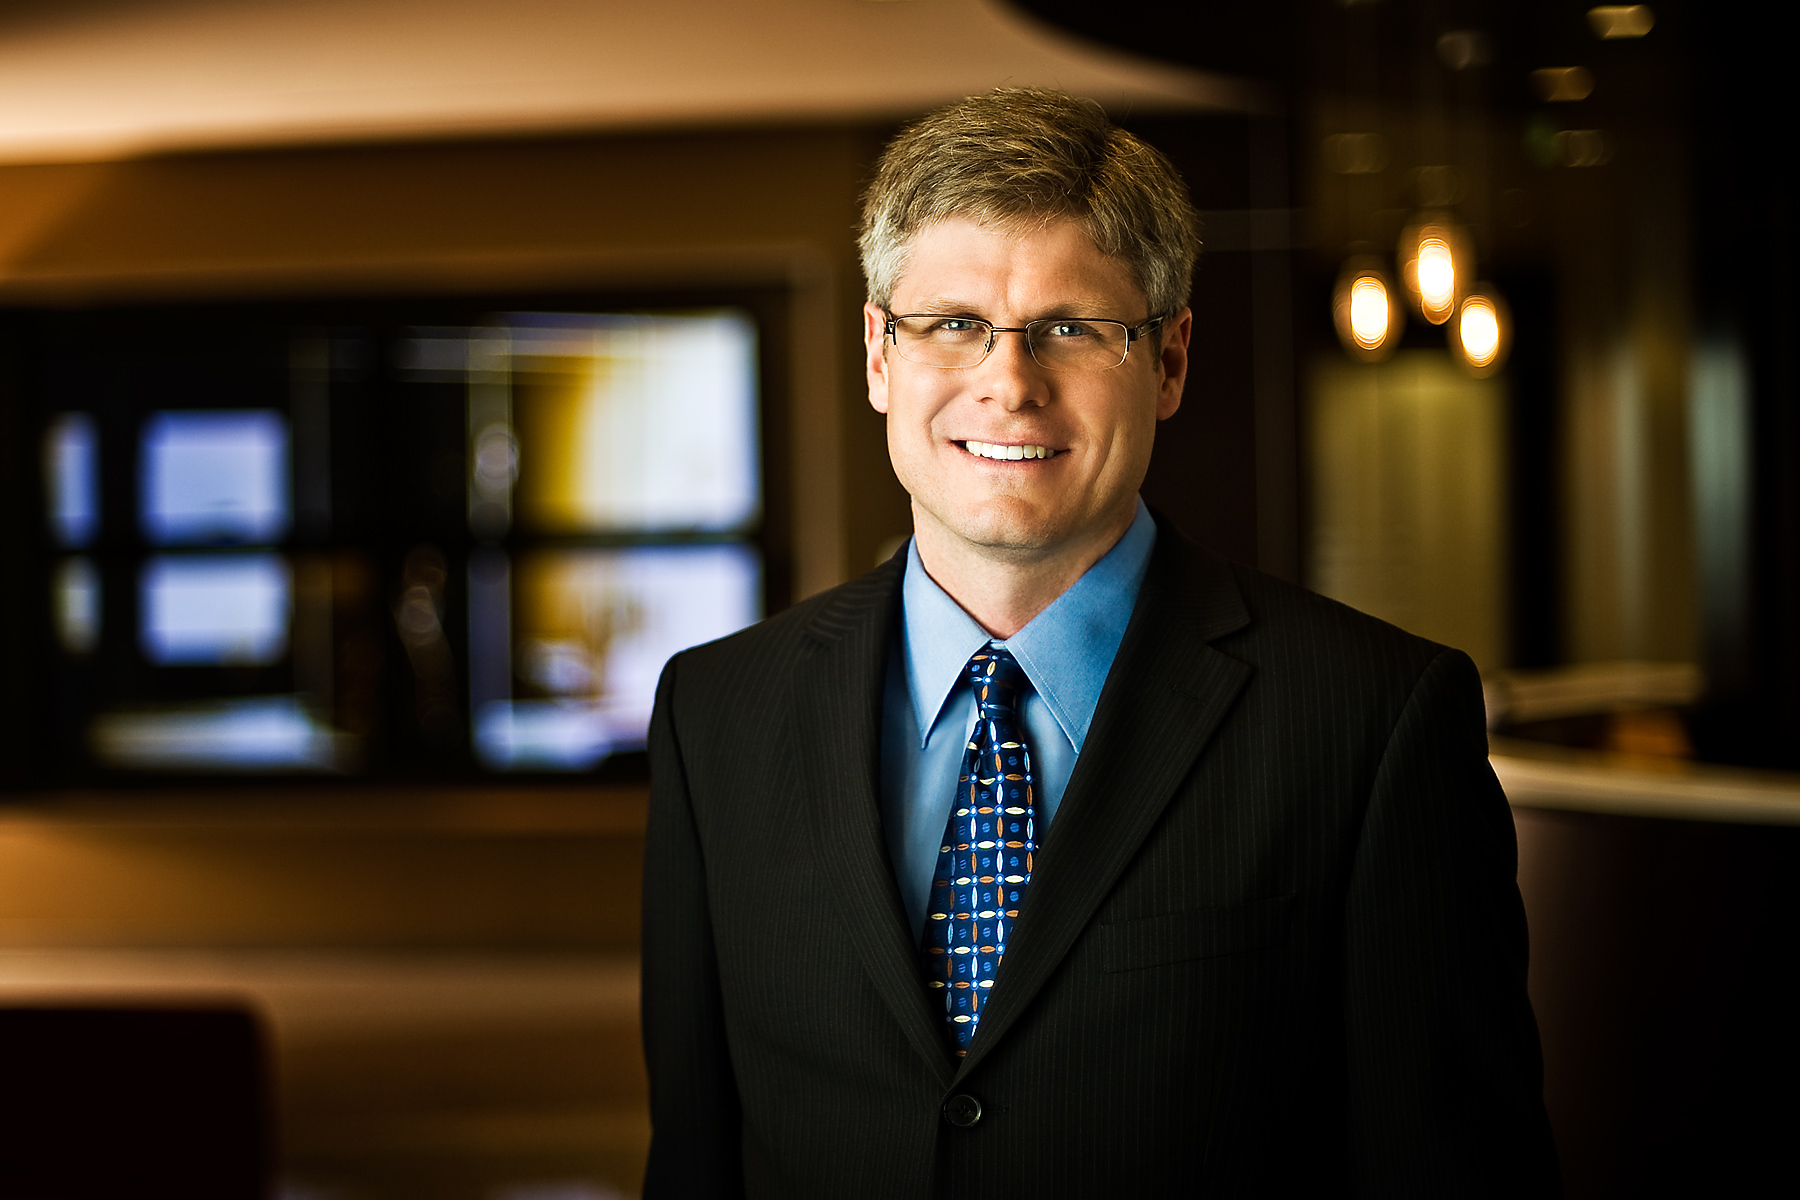 Qualcomm COO'su Steve Mollenkopf da Microsoft'un CEO adayları arasında